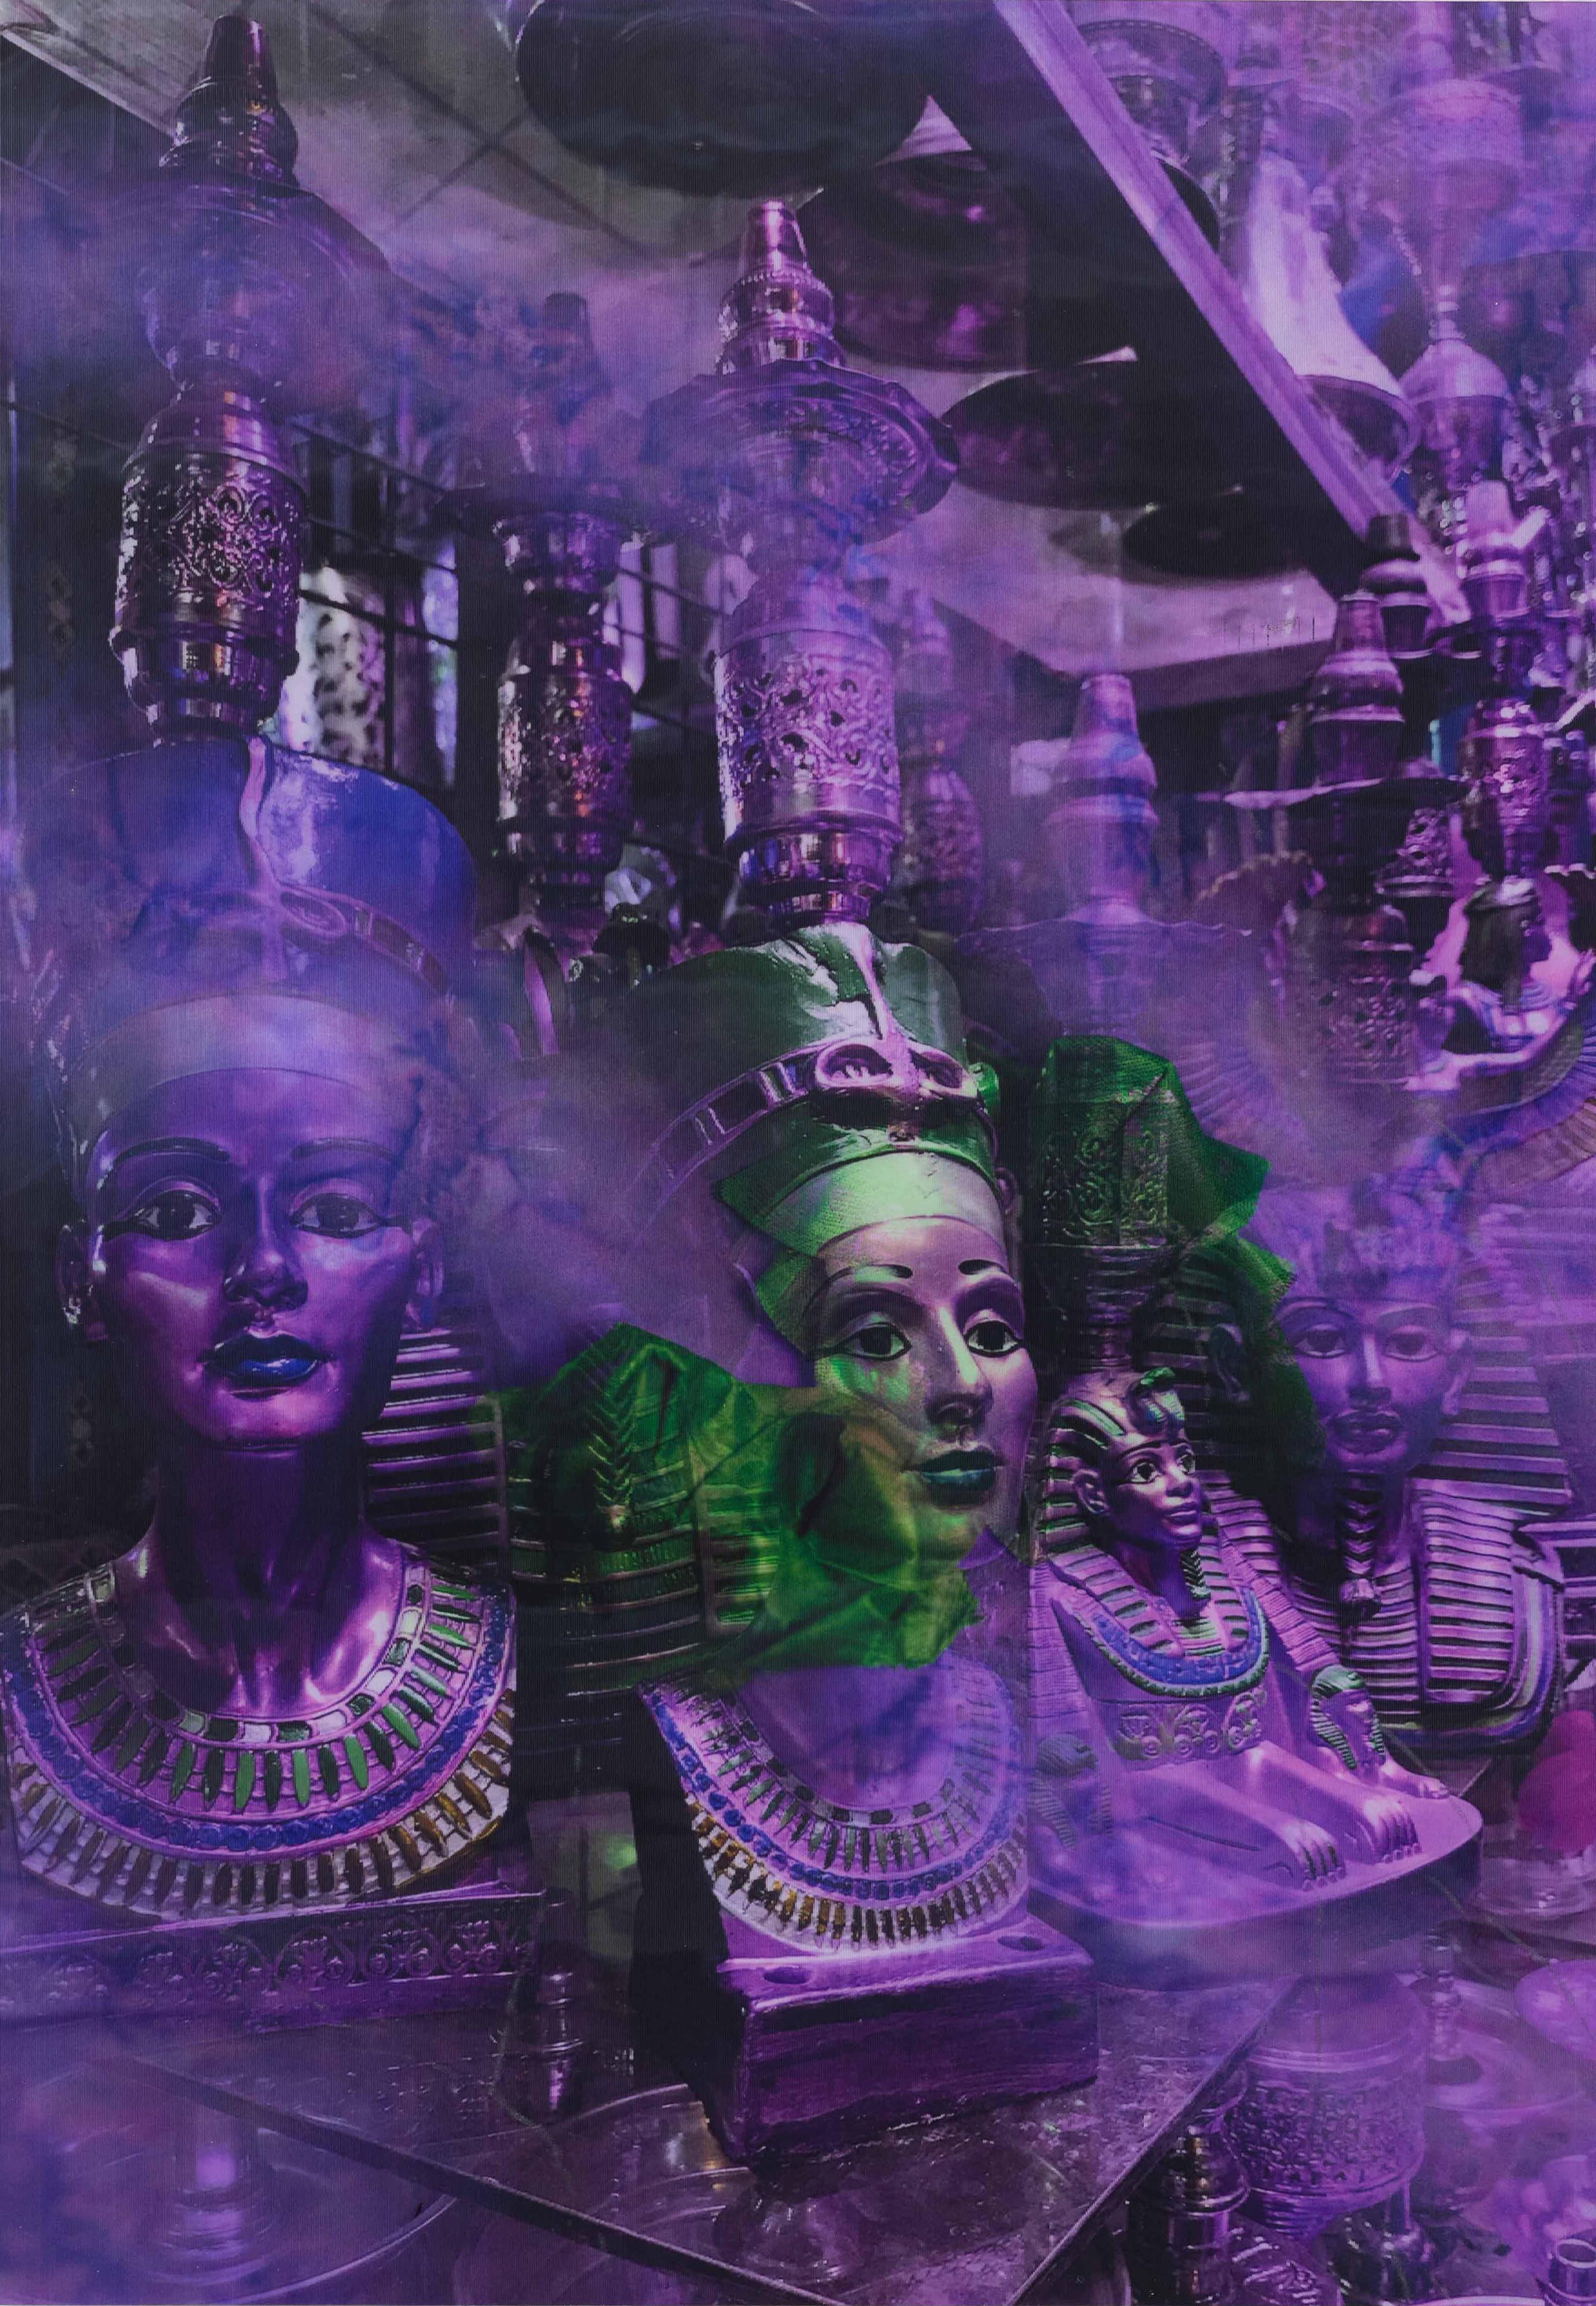 Galerie Barbara Thumm \ New Viewings #8 \ New Viewings #8